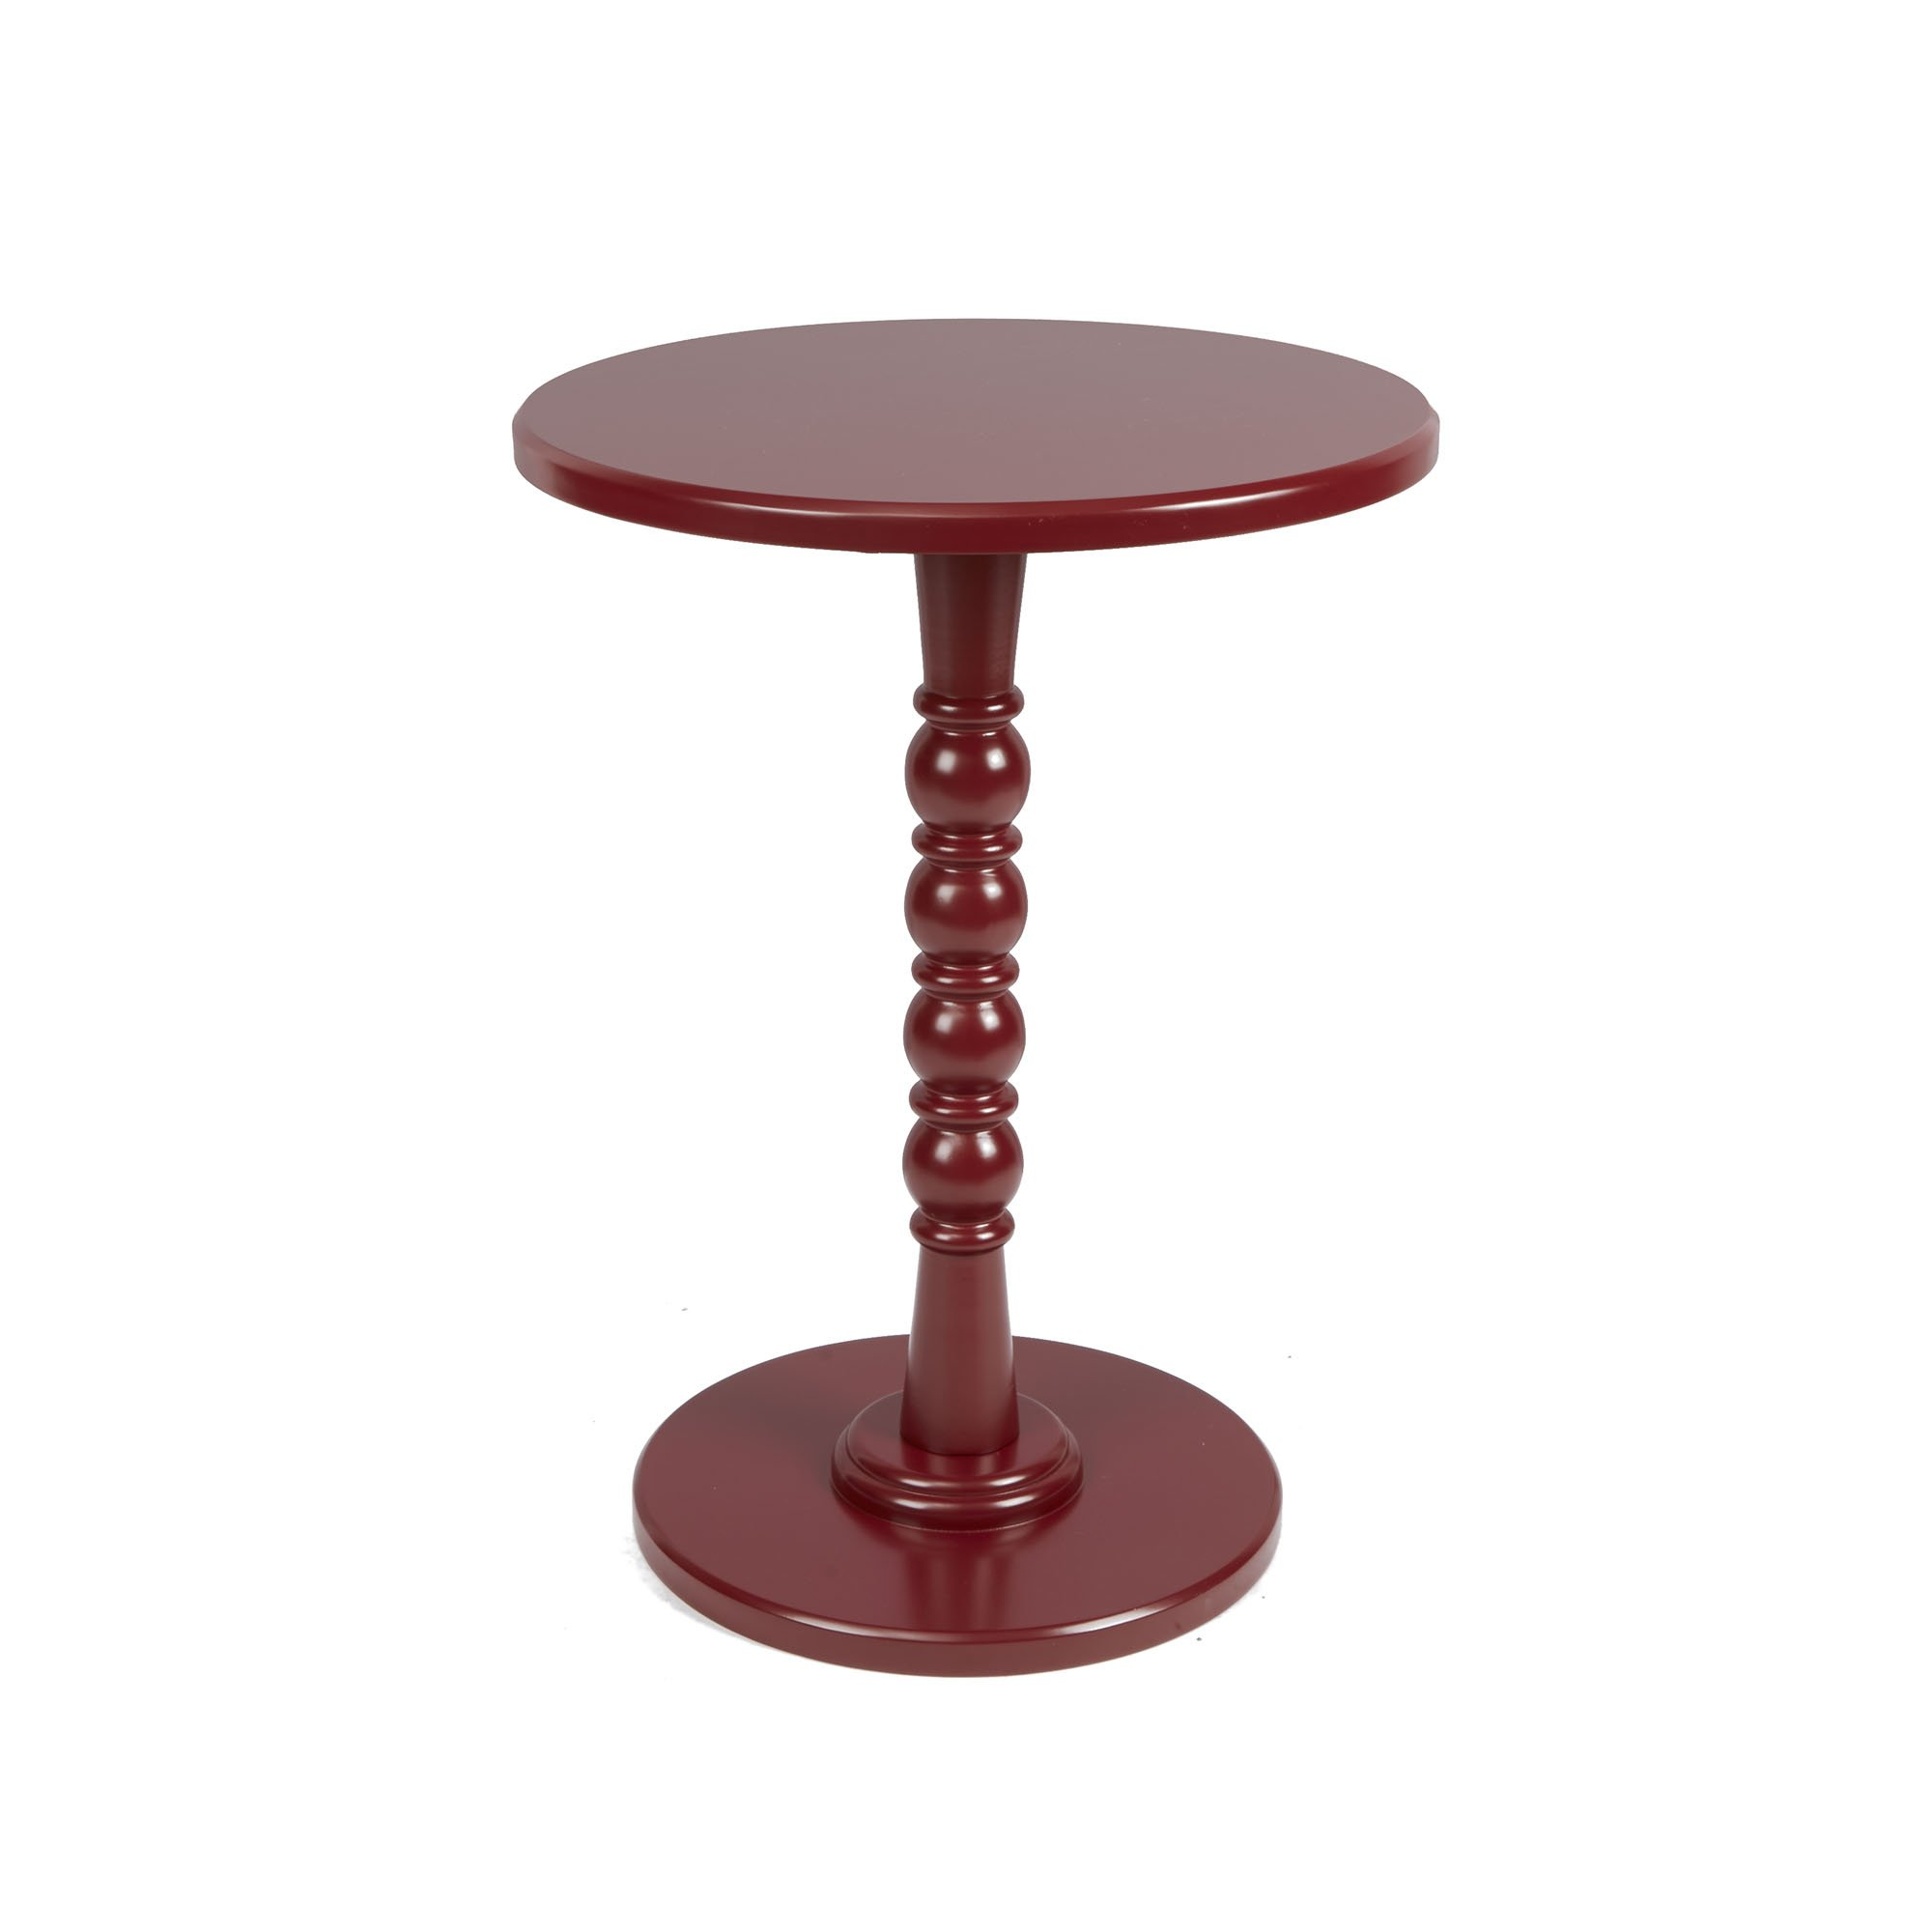 Silverwood FT1285 Elise Turned Pedestal Table, Red